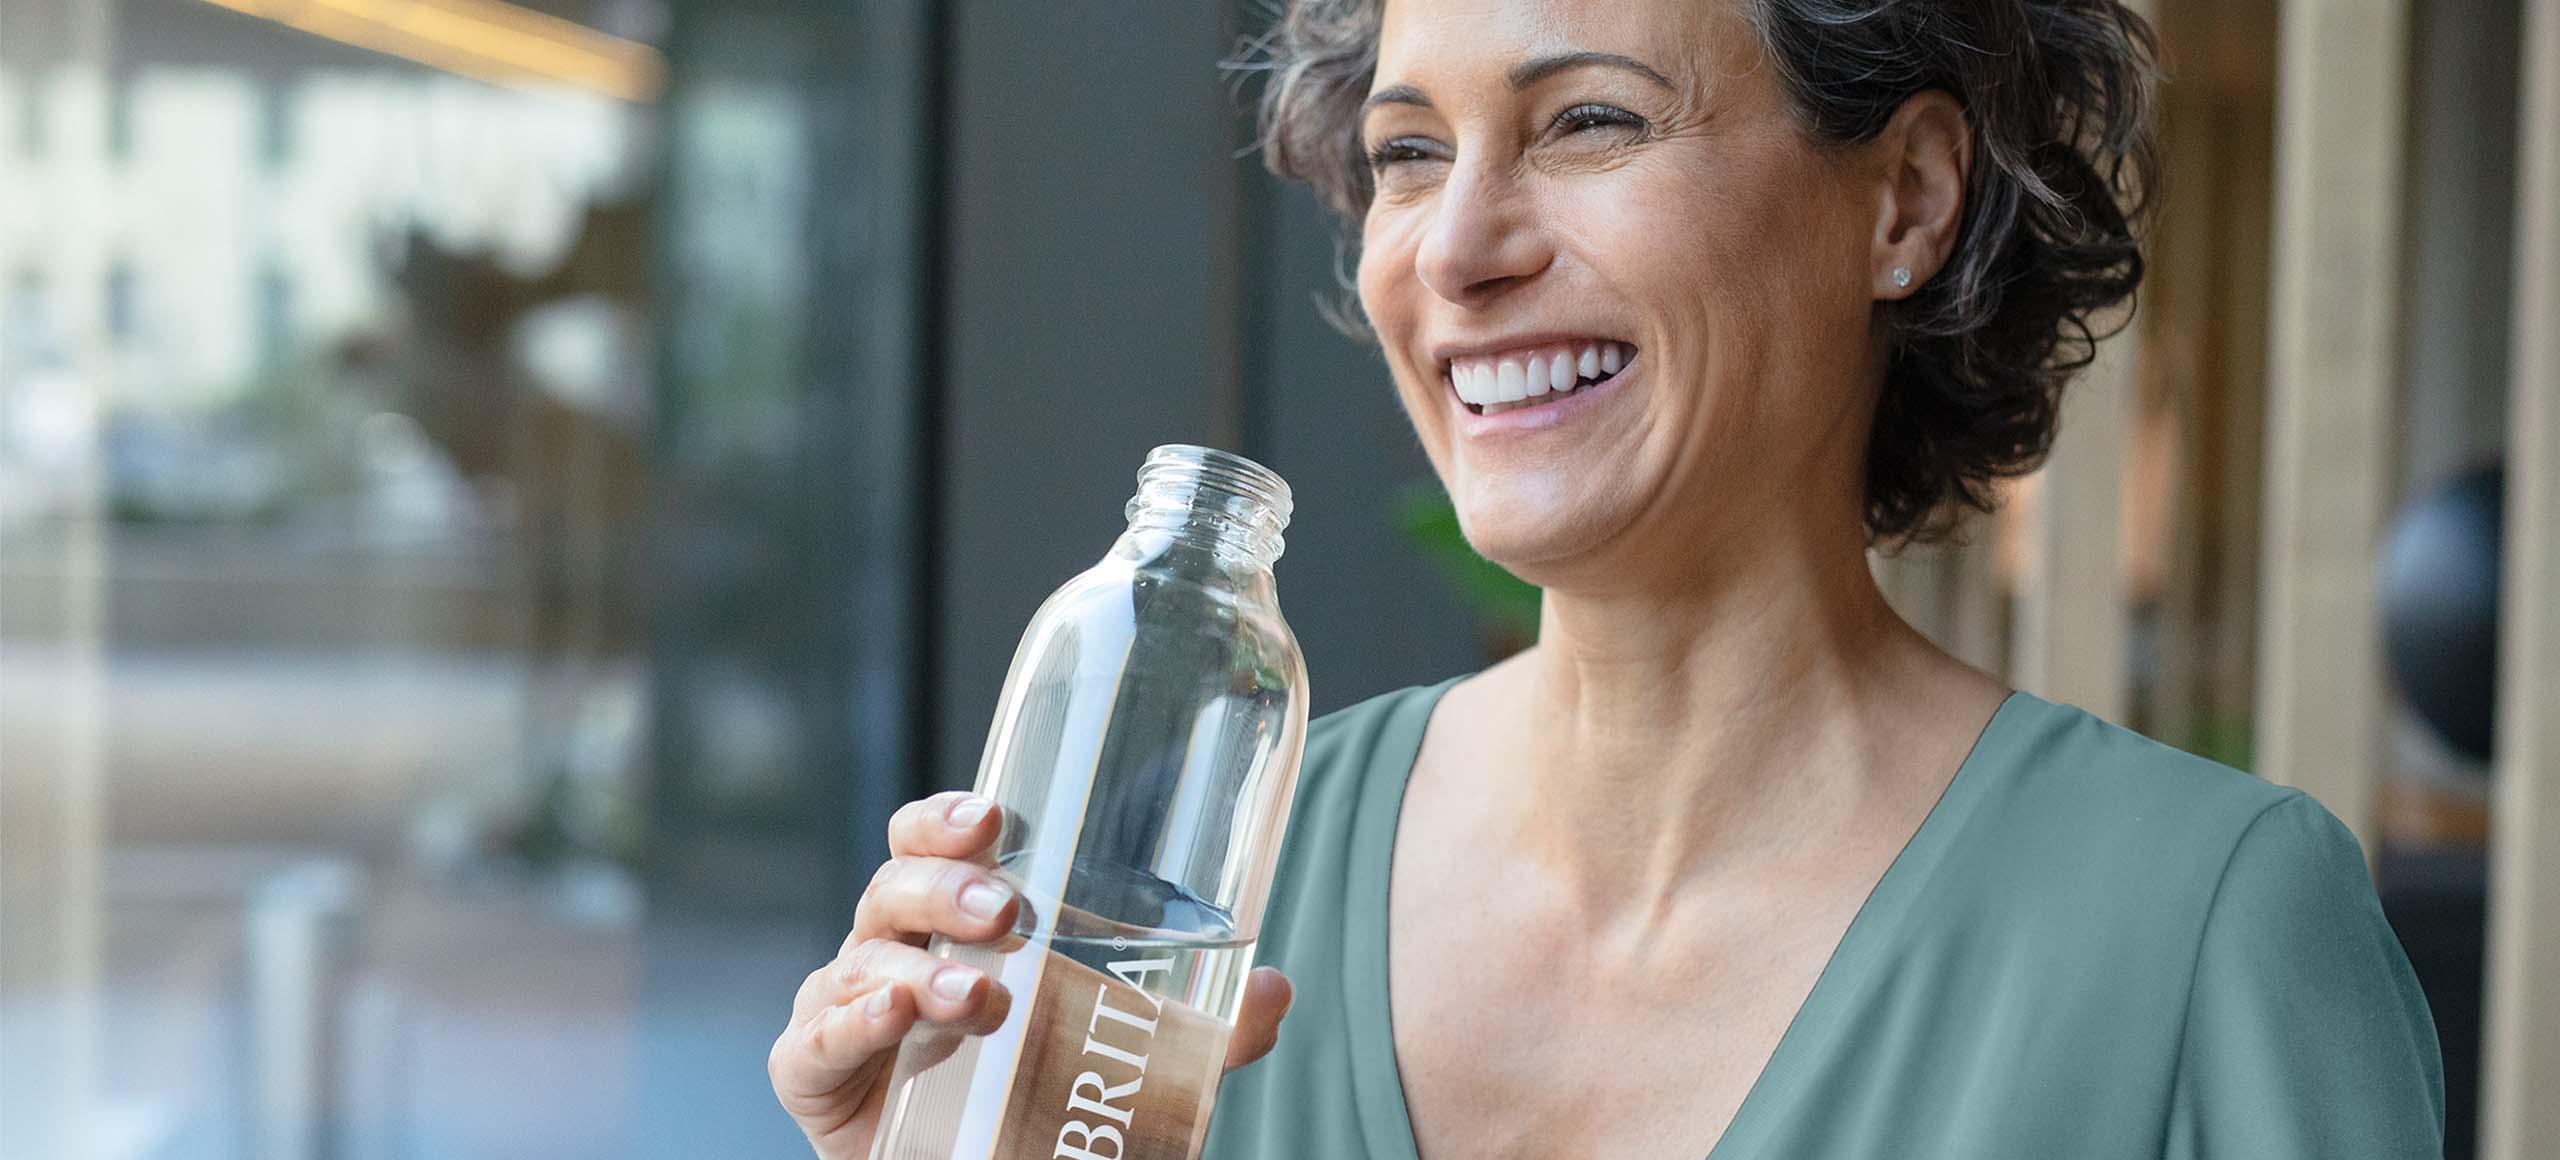 Vrouw drinkt water BRITA waterfles